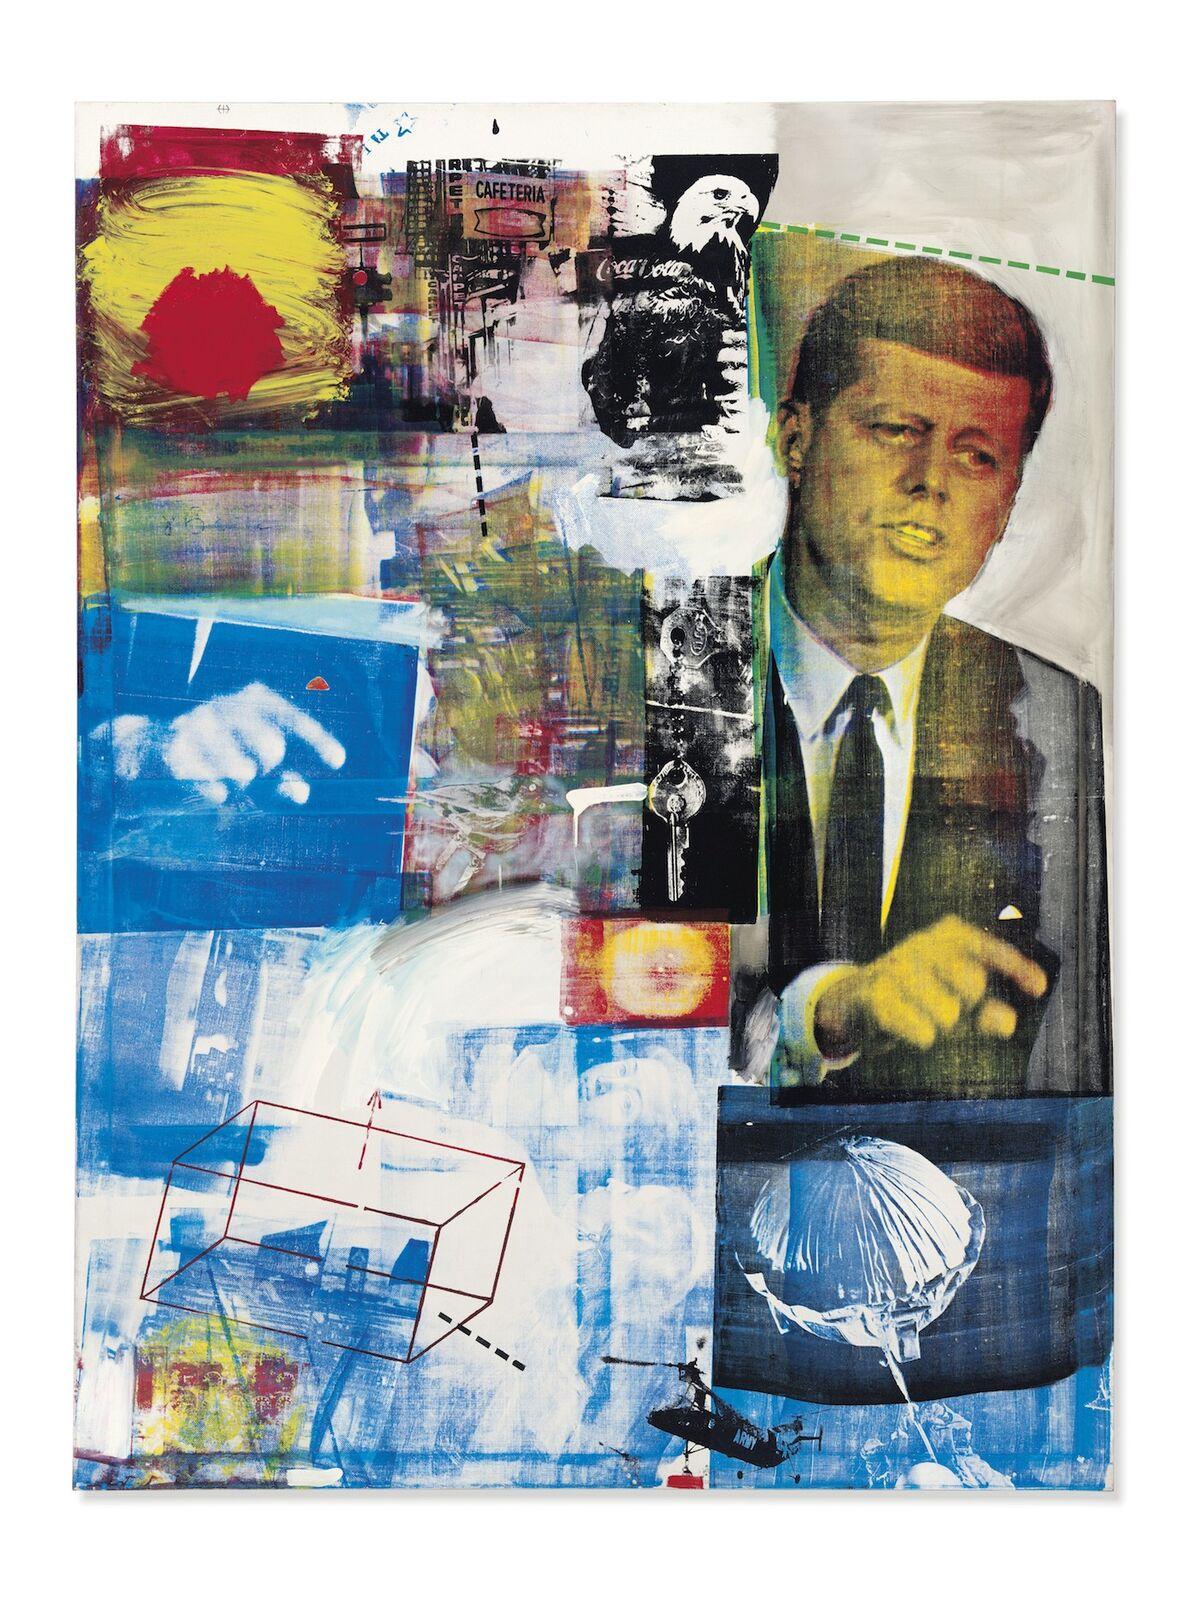 Robert Rauschenberg, Buffalo II, 1964. Courtesy of Christie's Images Ltd.